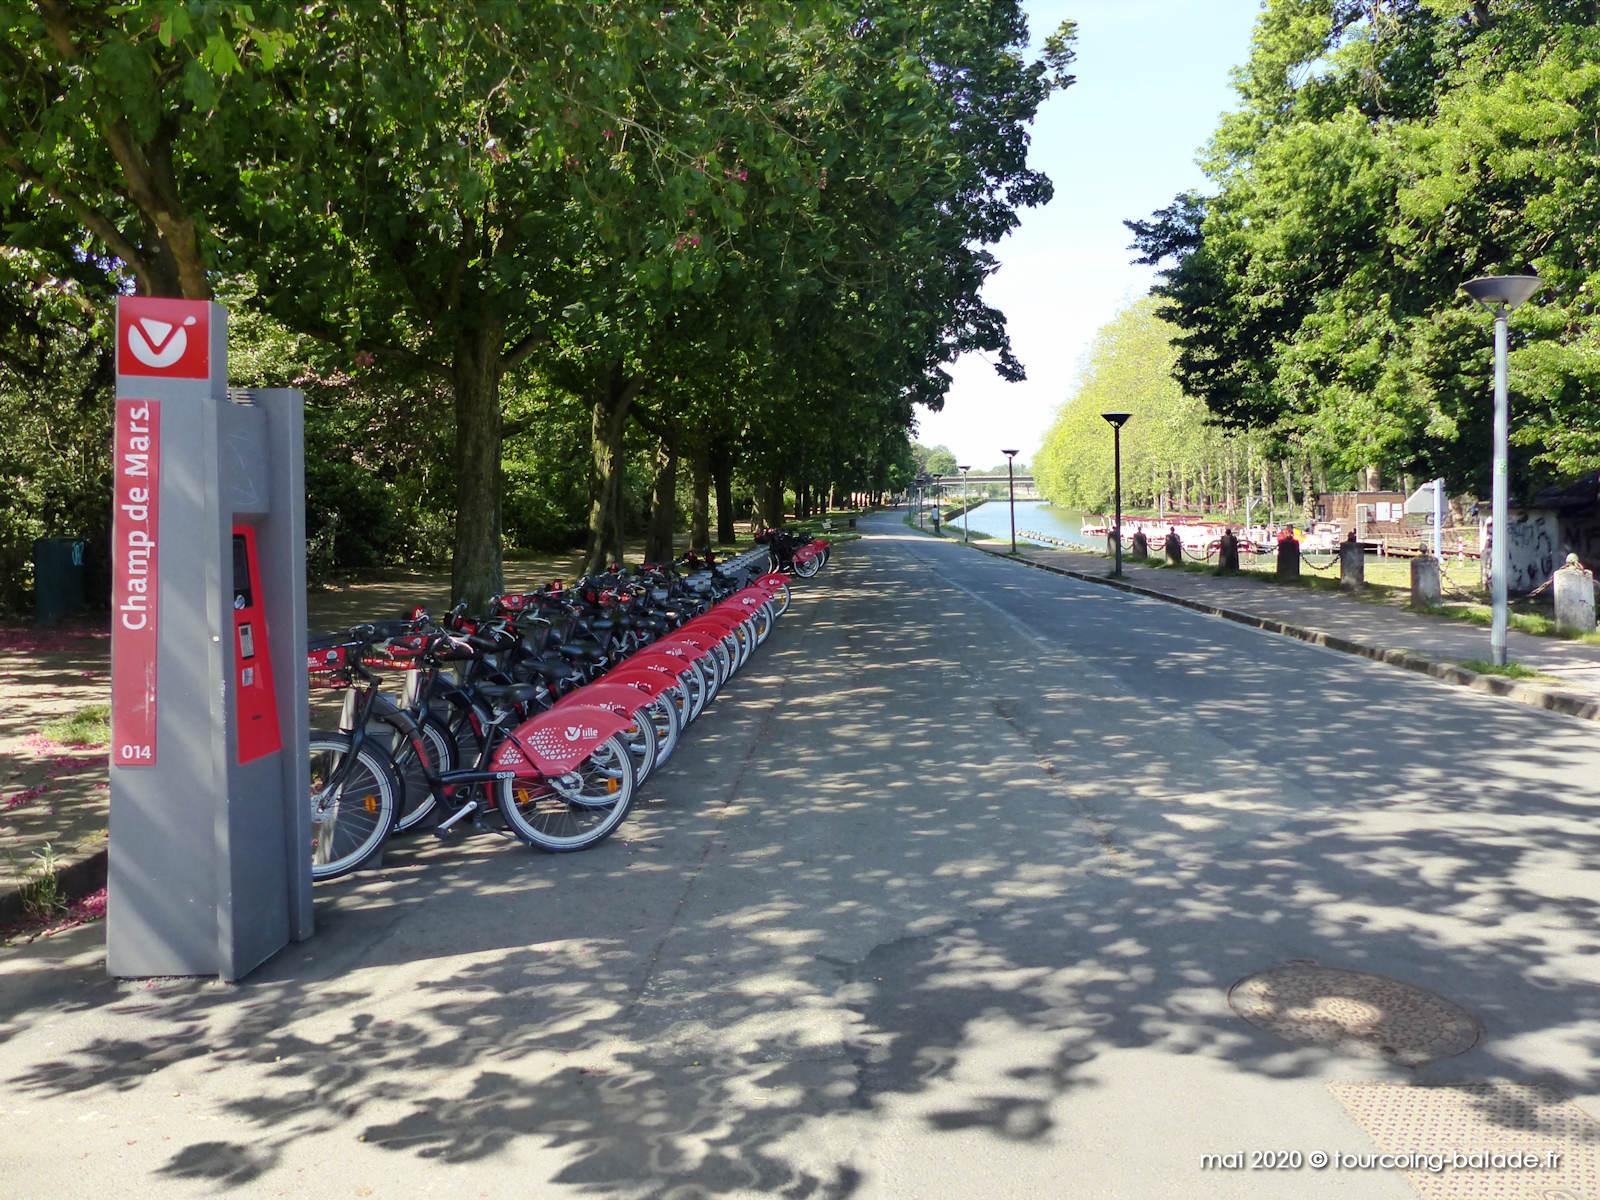 Station V'Lille Champs de Mars, Lille 2020